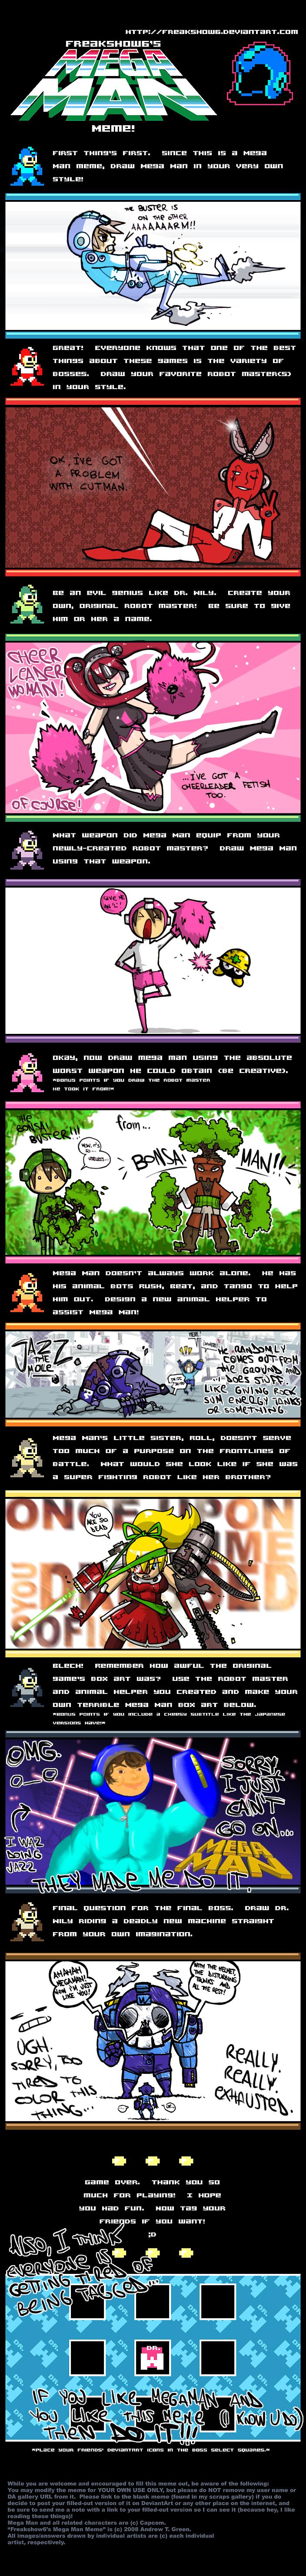 Teh Mega Man meme by Mensieur-A